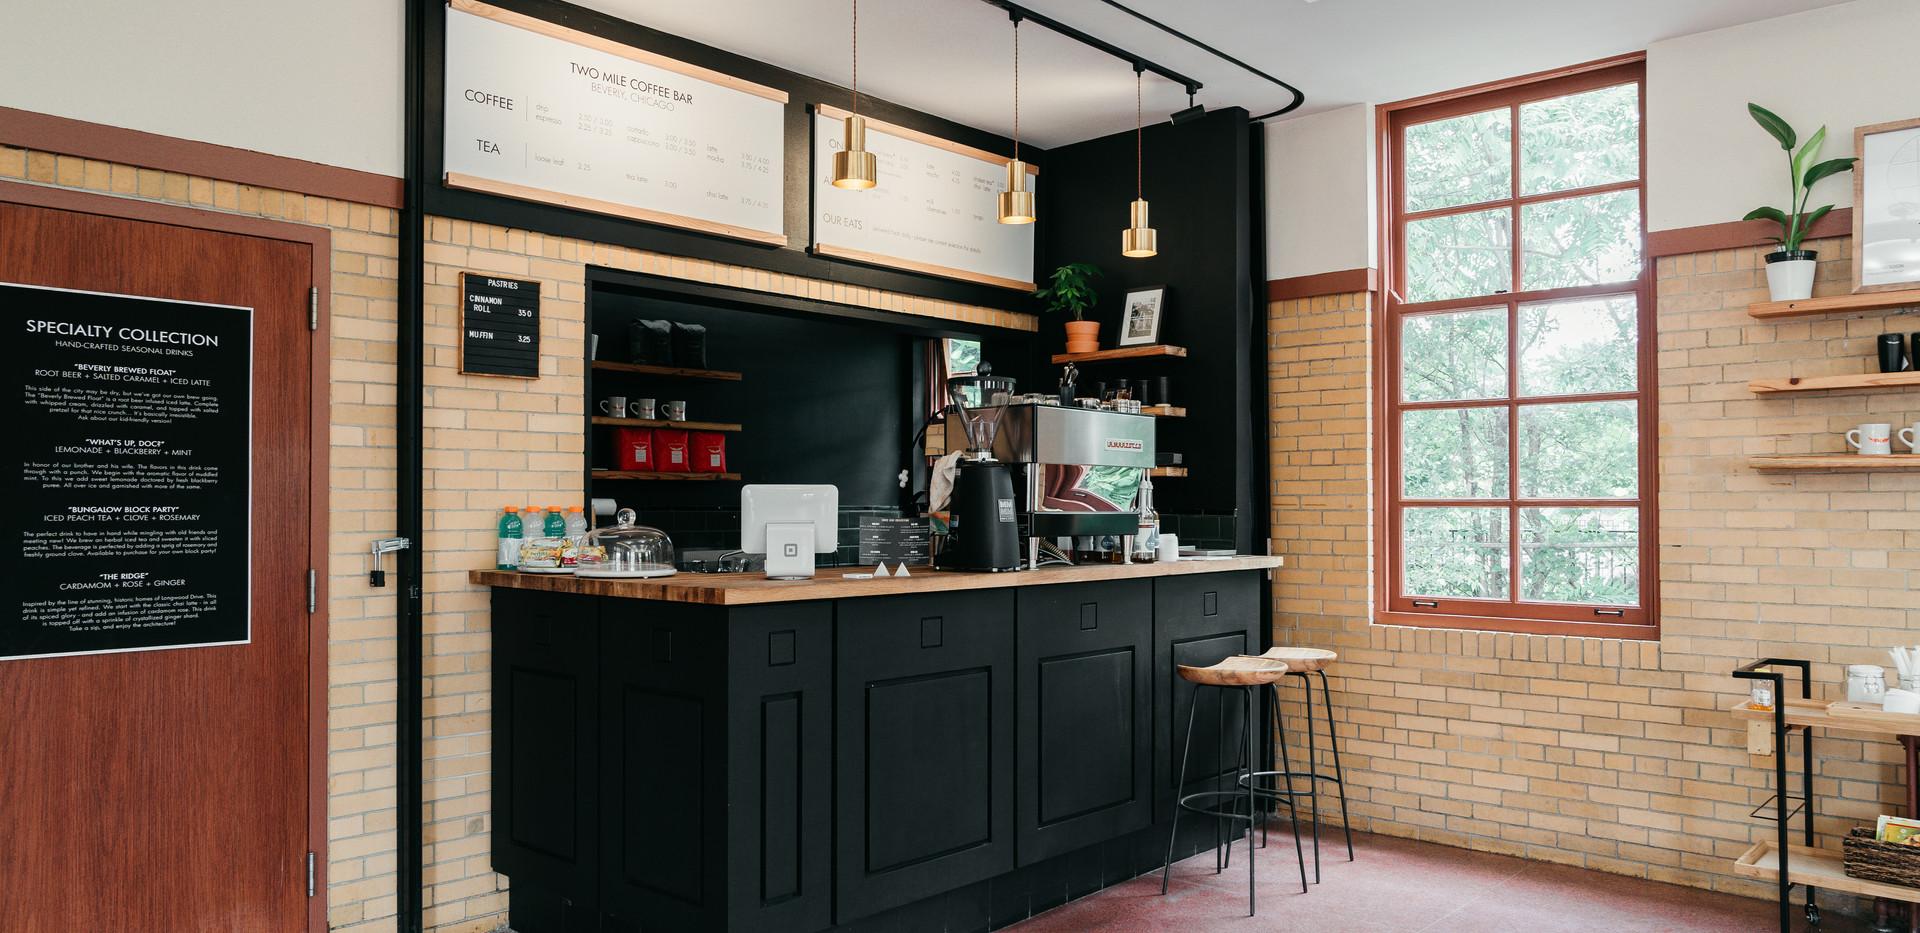 Two Mile Coffee - Bradley Moss (68 of 94